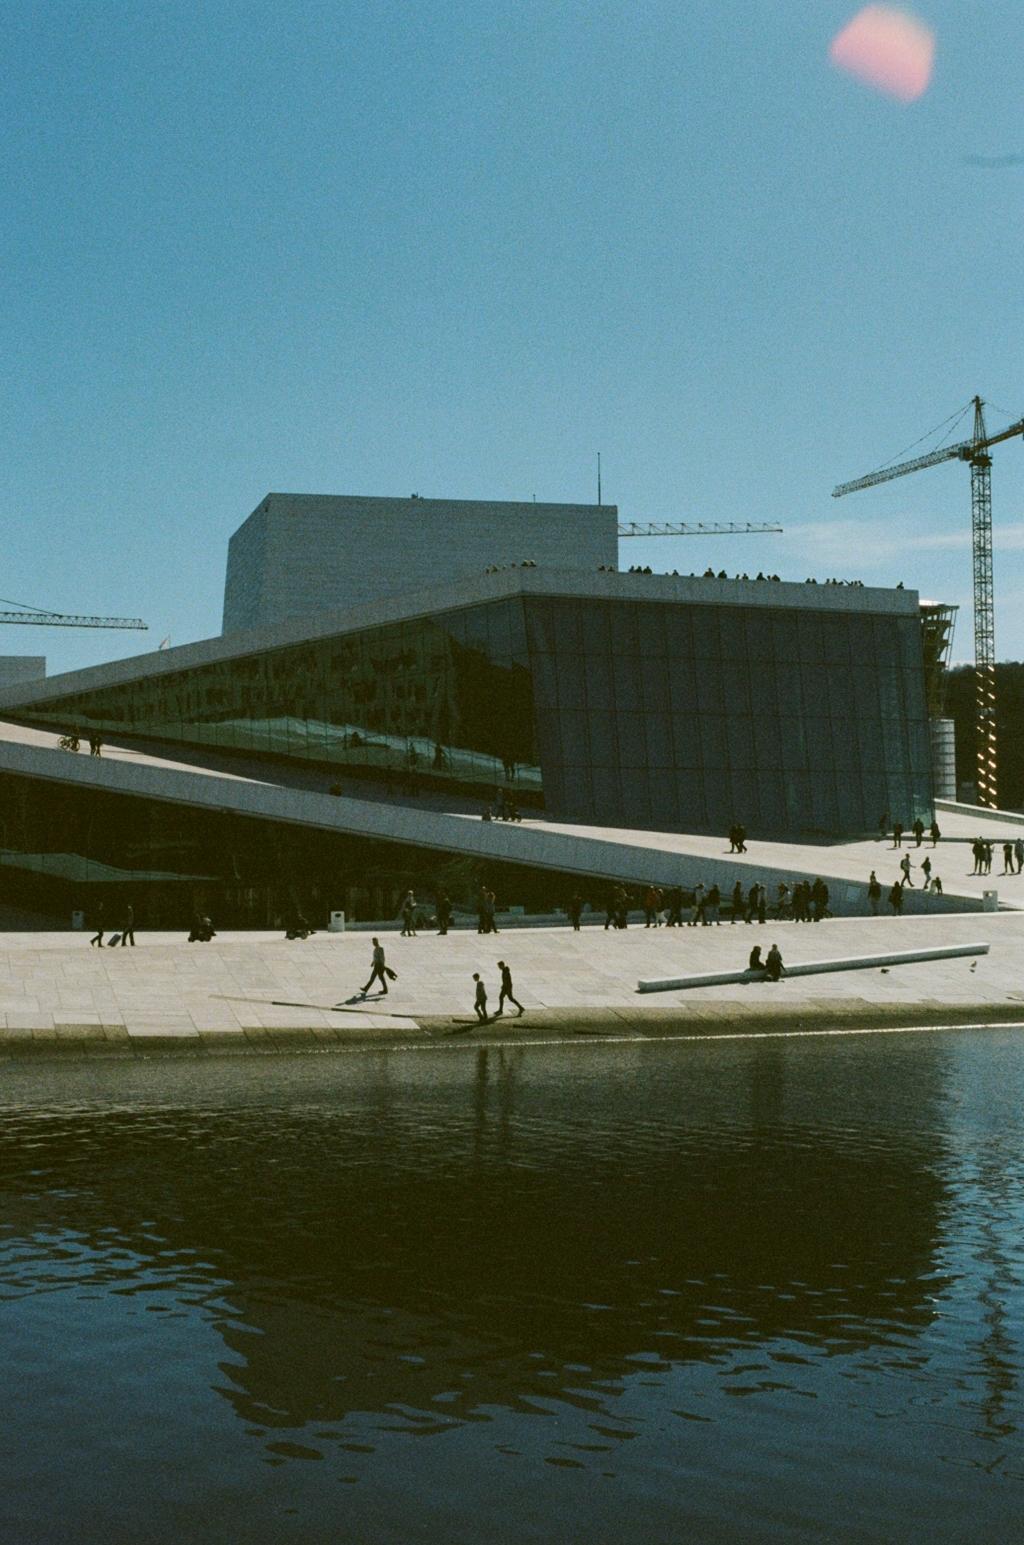 Oslo Opera House. Oslo, Norway